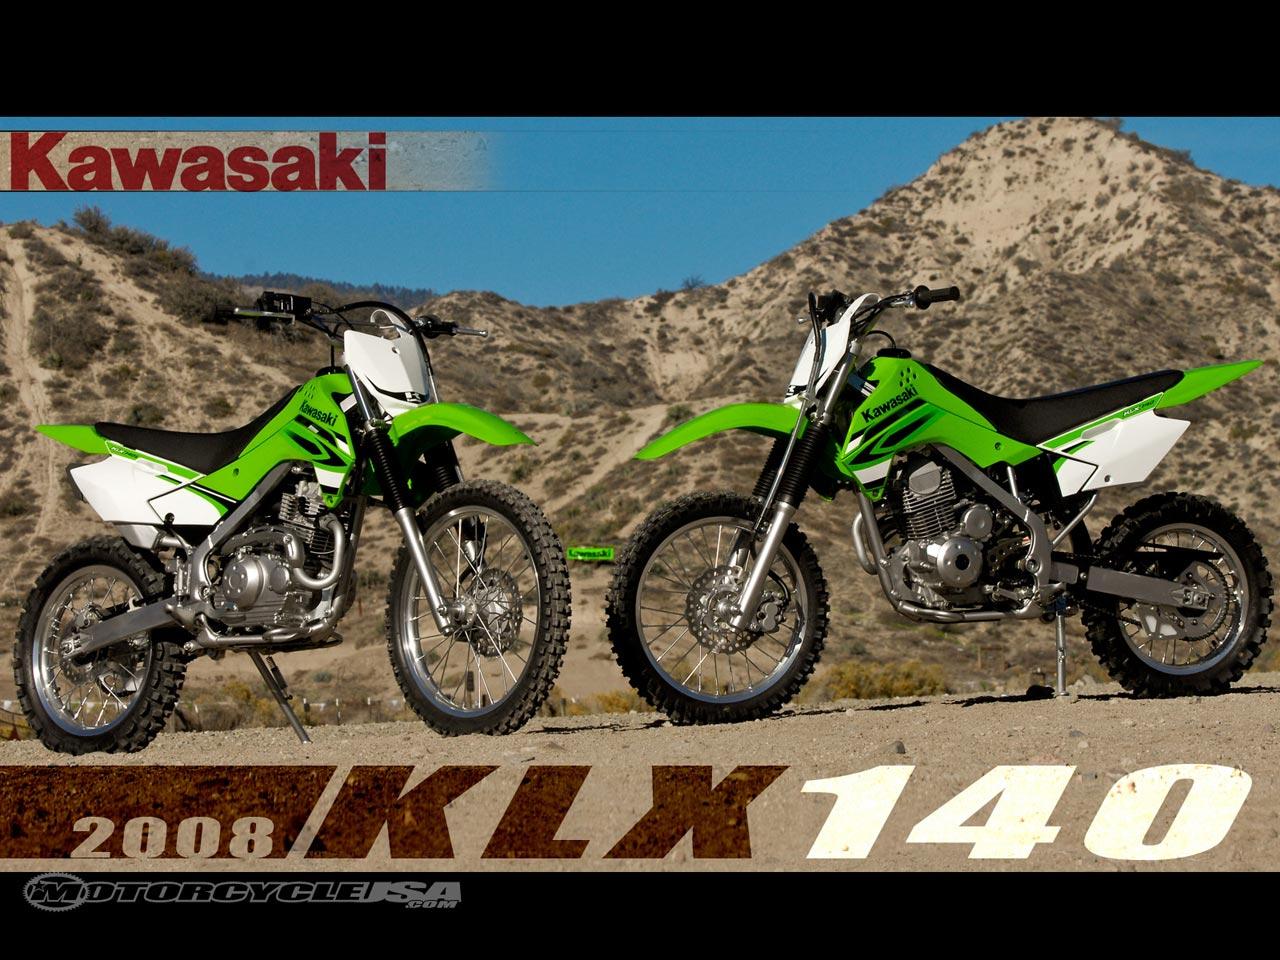 hight resolution of kawasaki klx140 6 kawasaki klx140 6